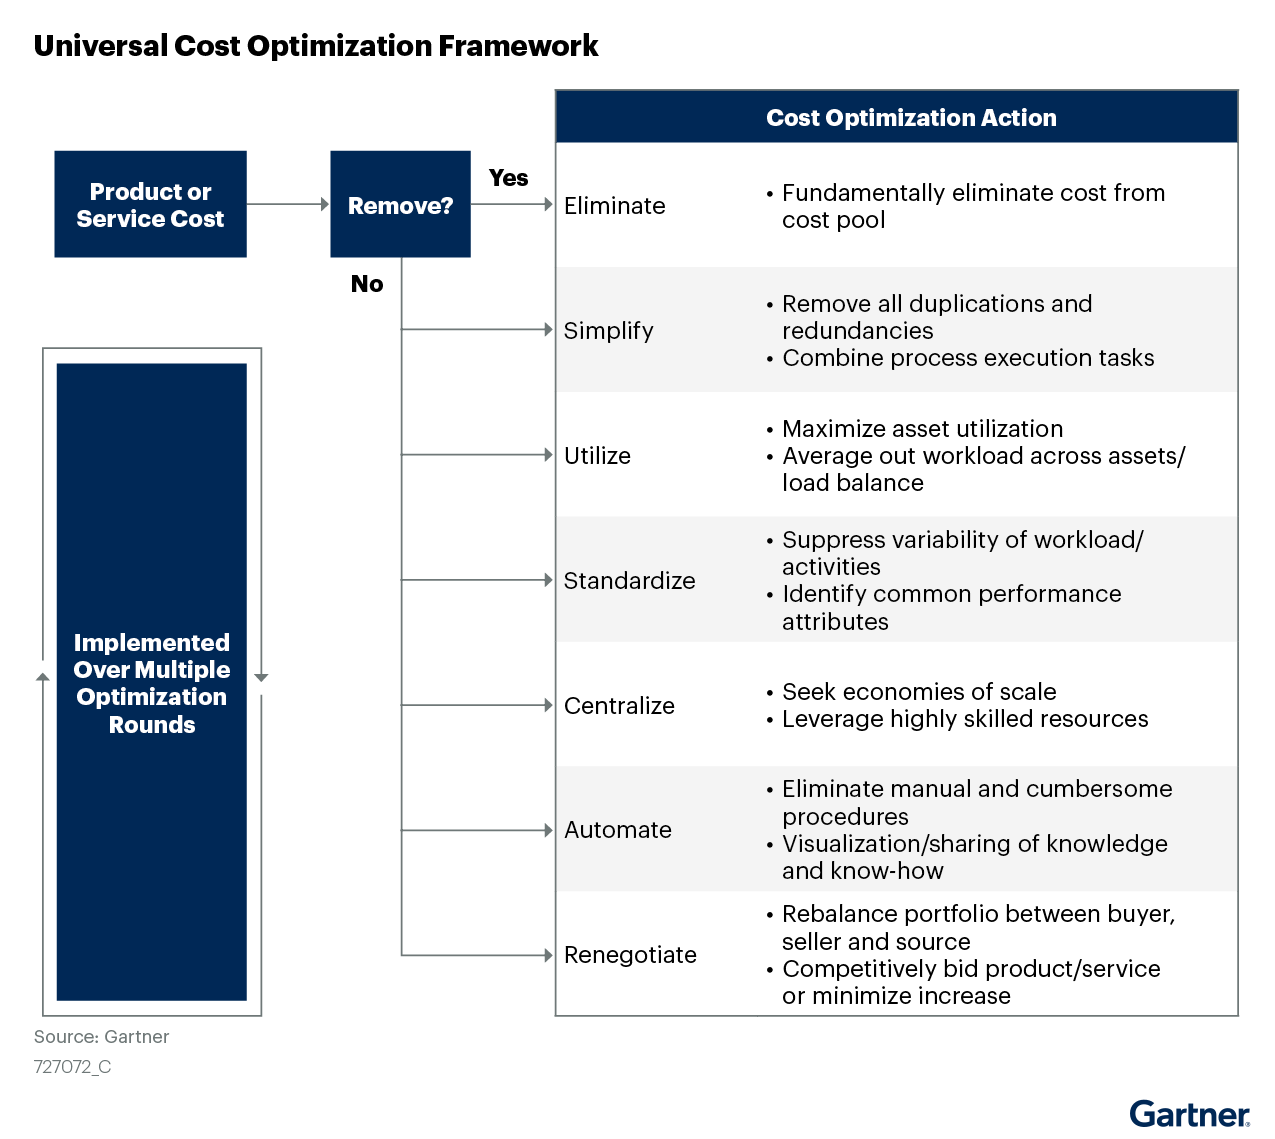 Figure 4: Universal Cost Optimization Framework